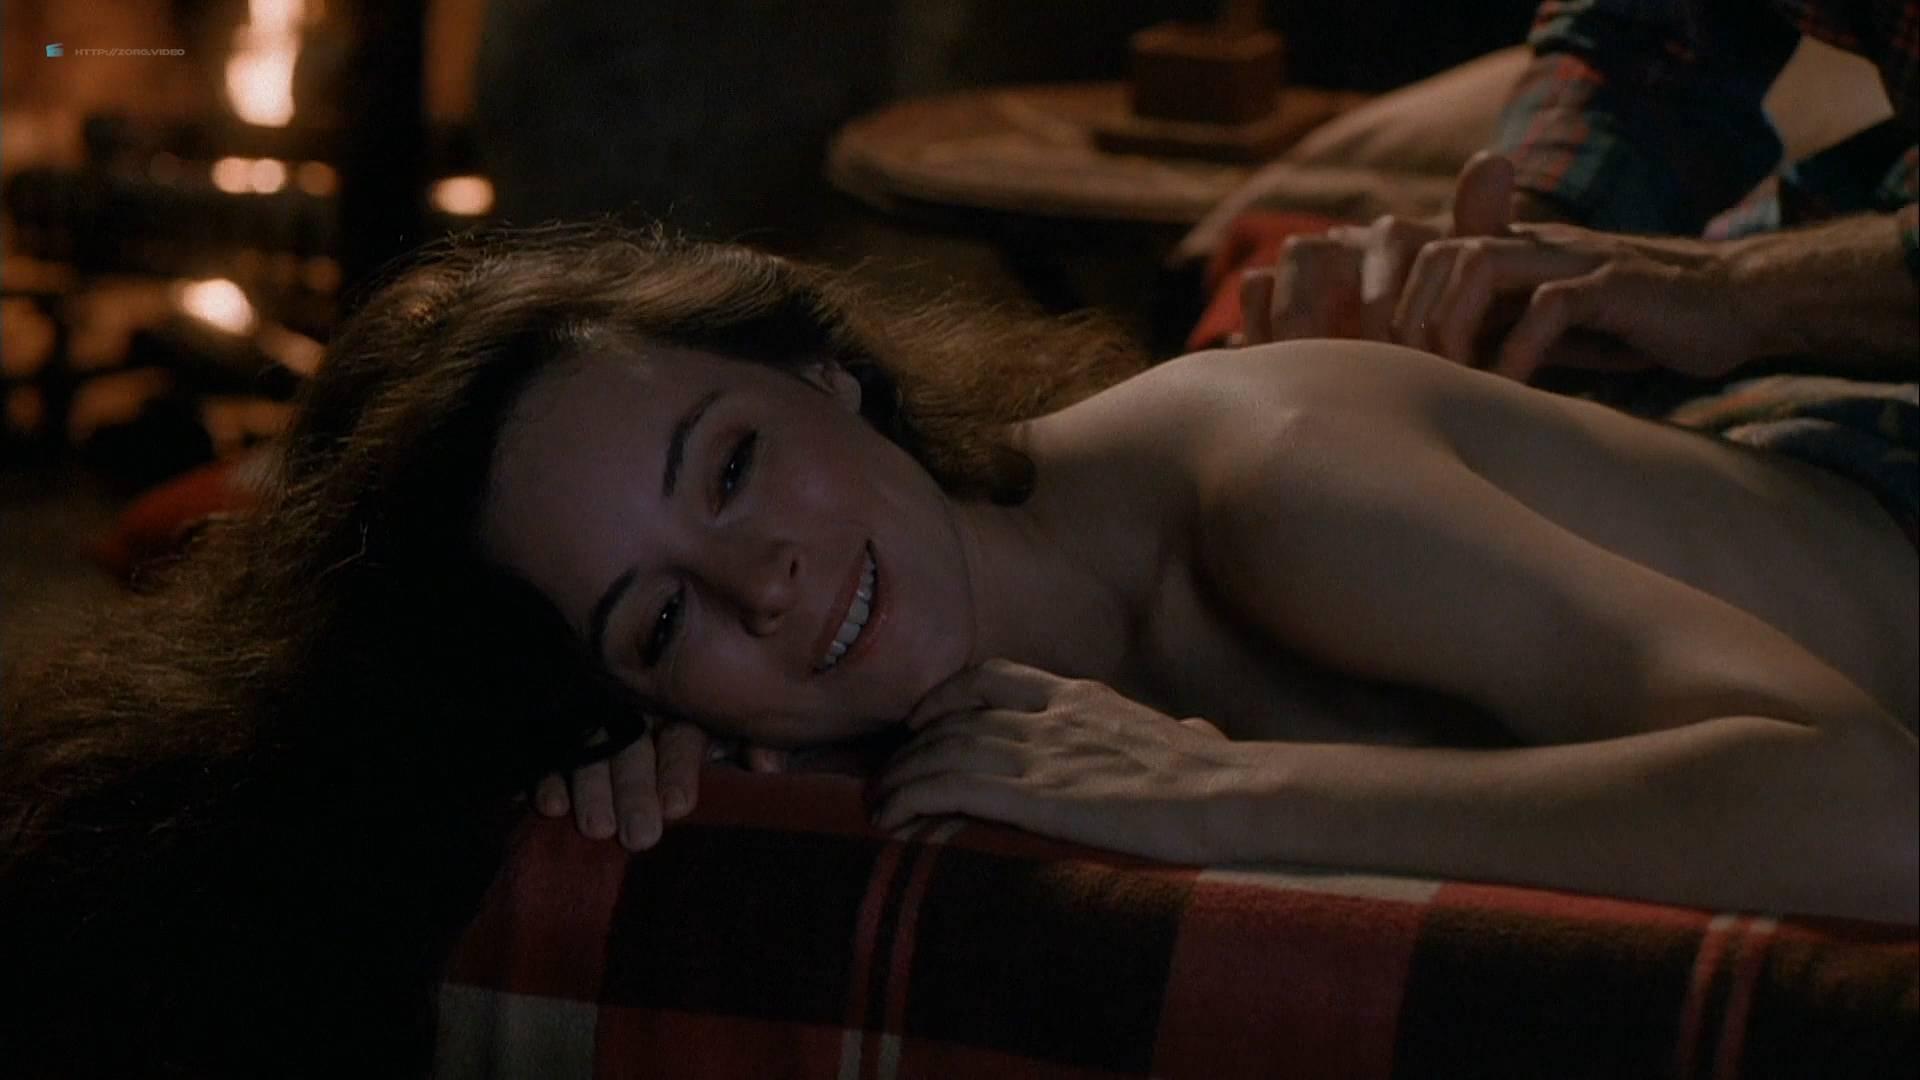 Leslie ann warren nude — img 2